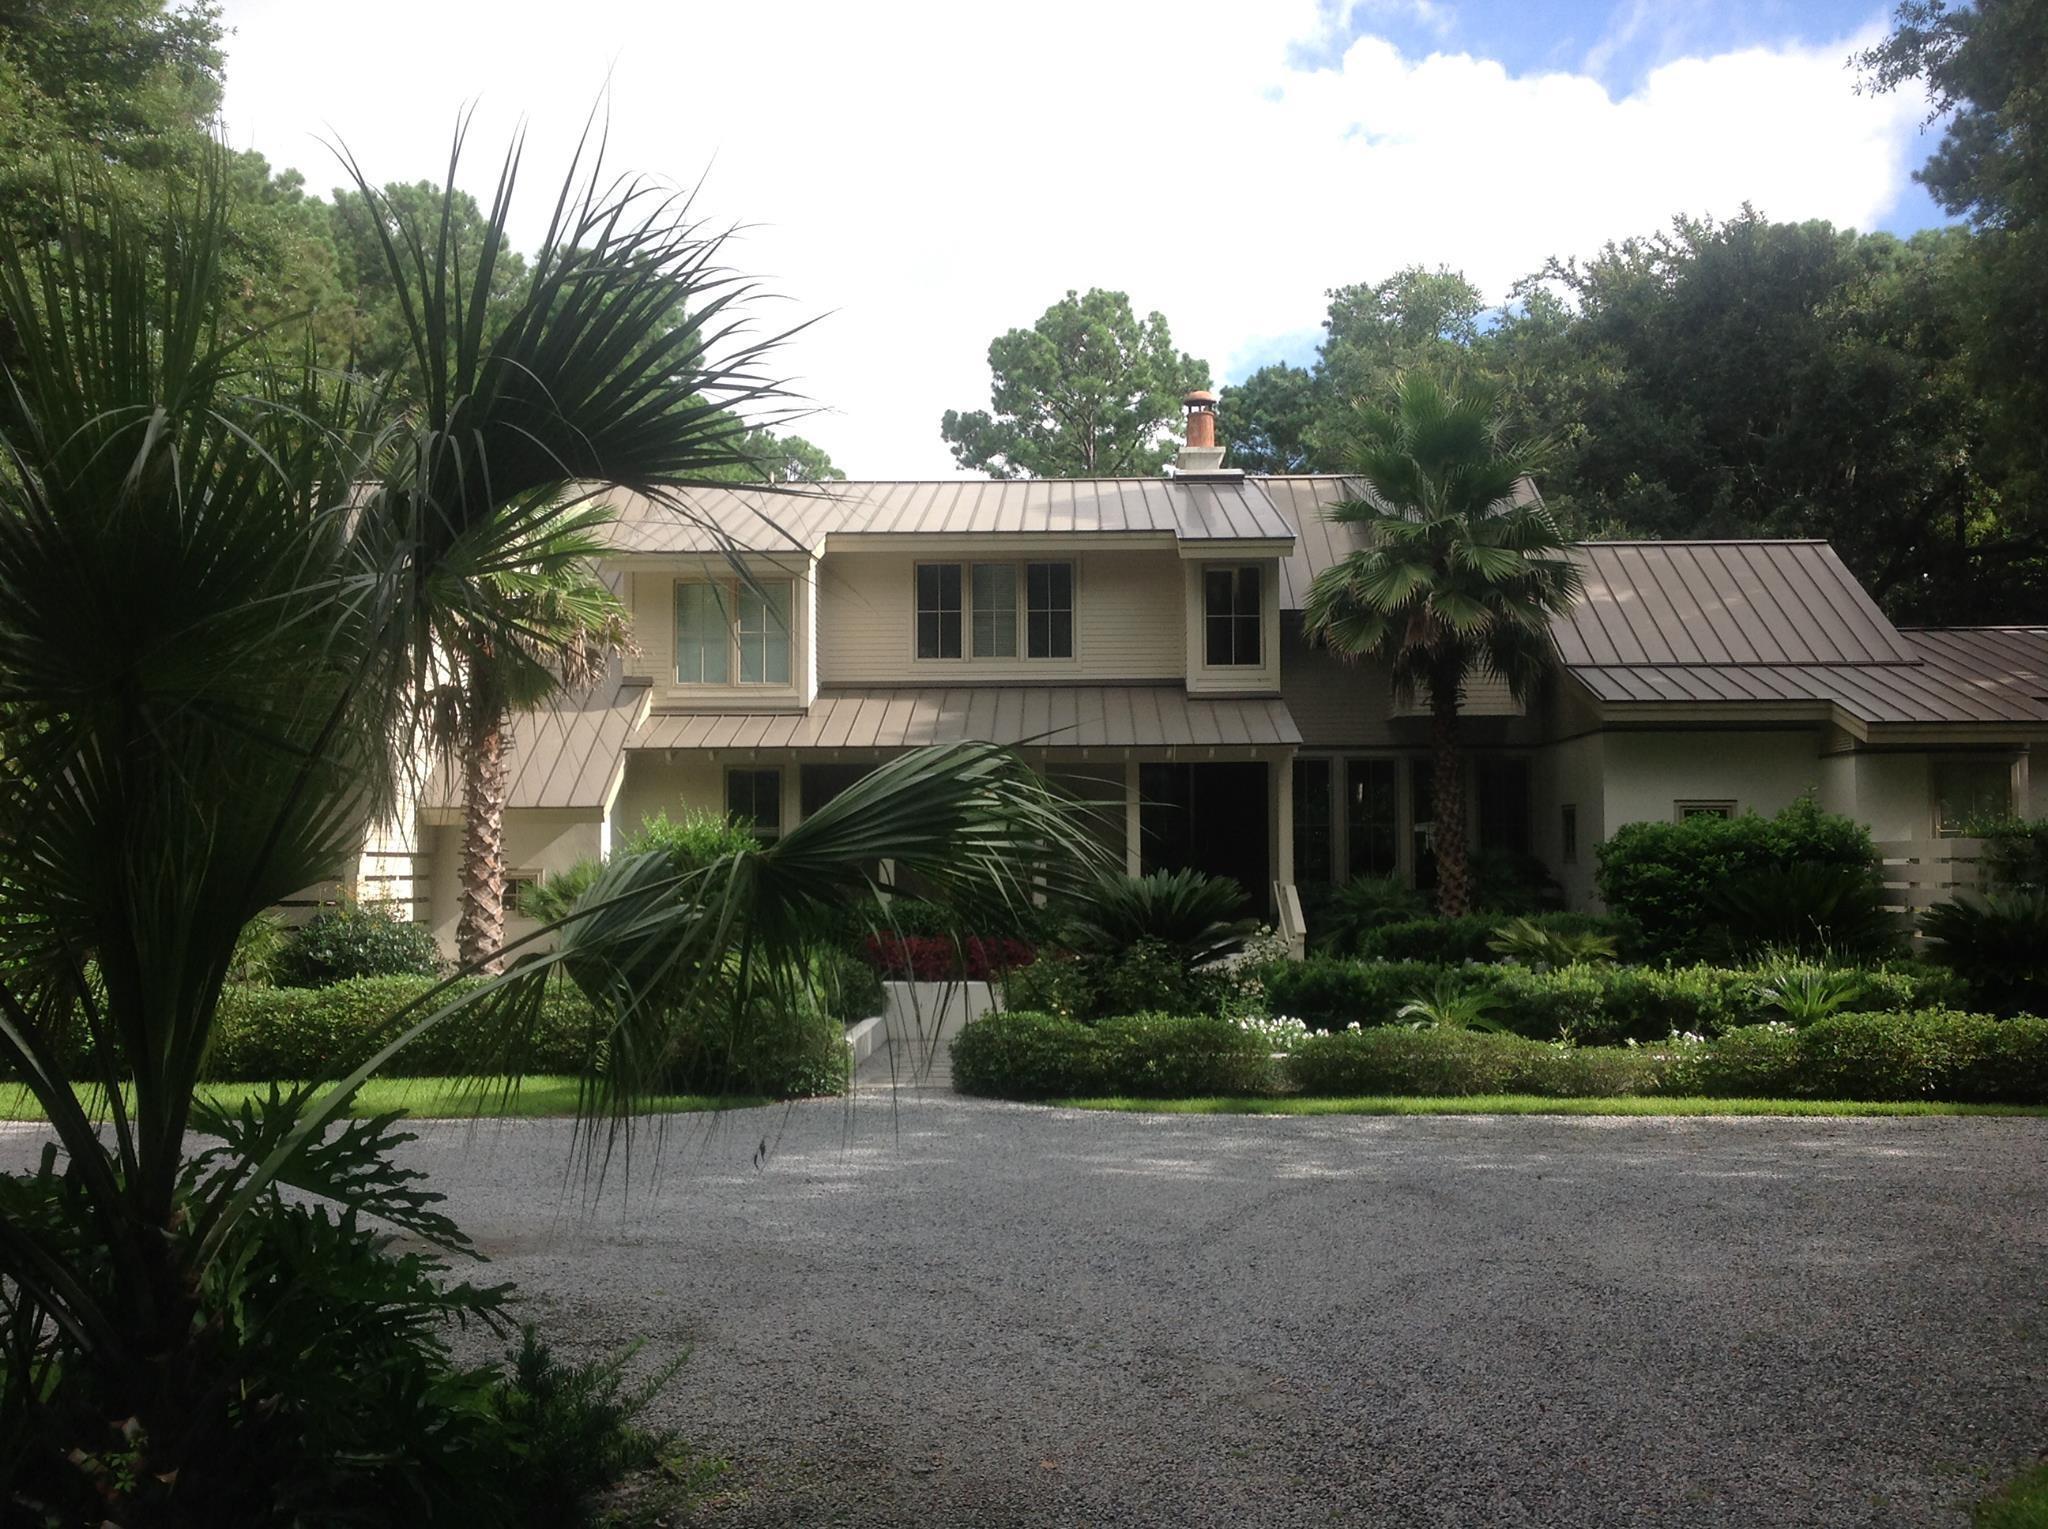 RoofCrafters-Savannah image 77